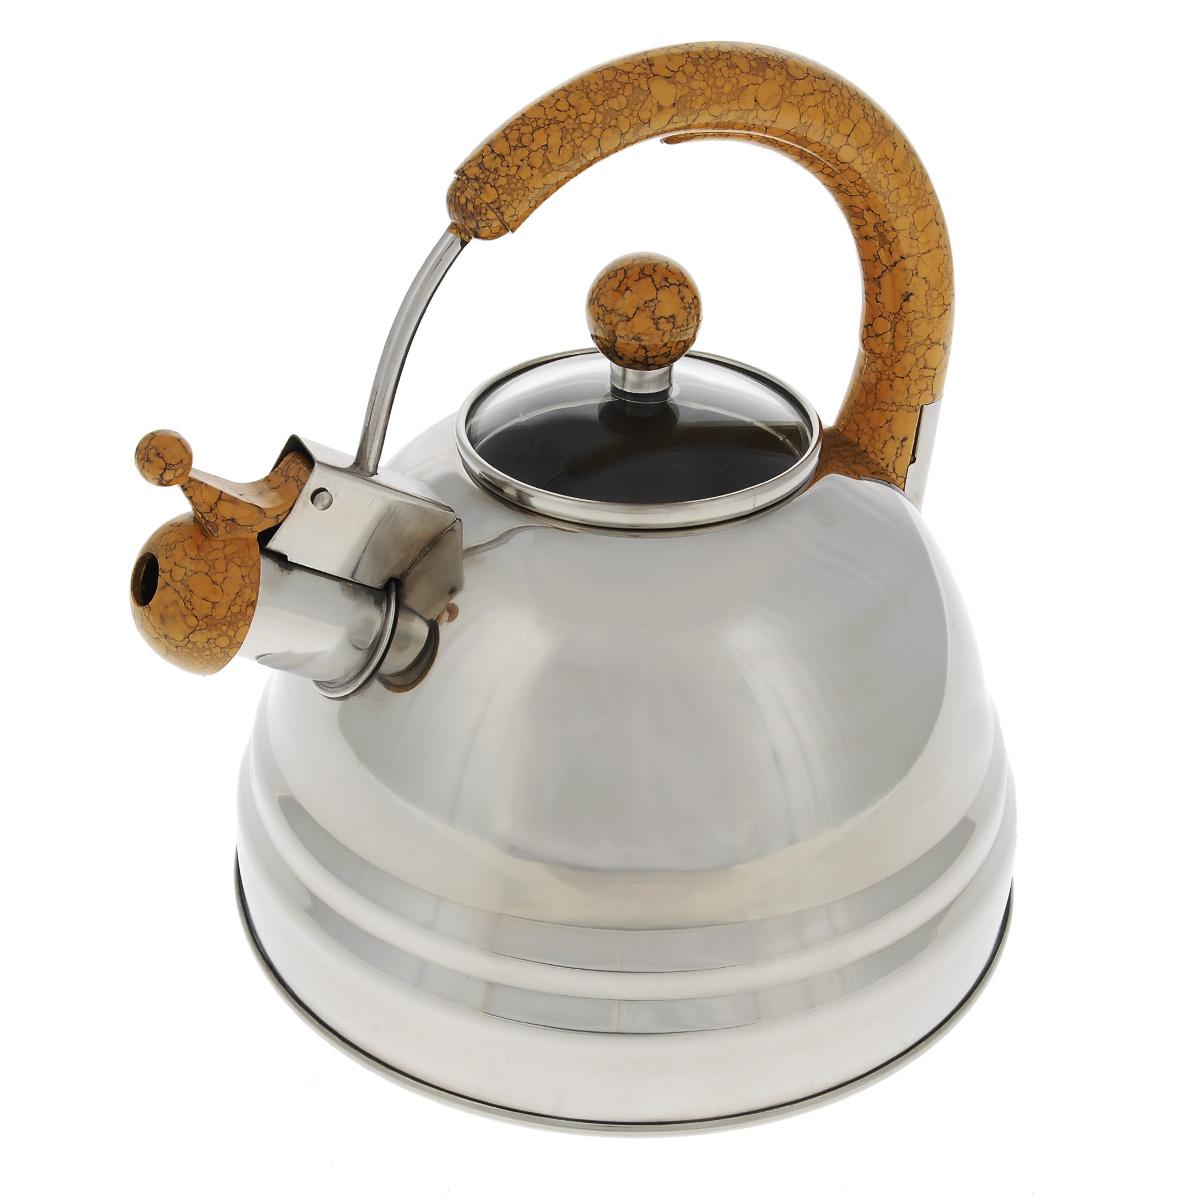 "Чайник Bekker ""Koch"" со свистком, цвет: коричневый, 3 л. BK-S368"